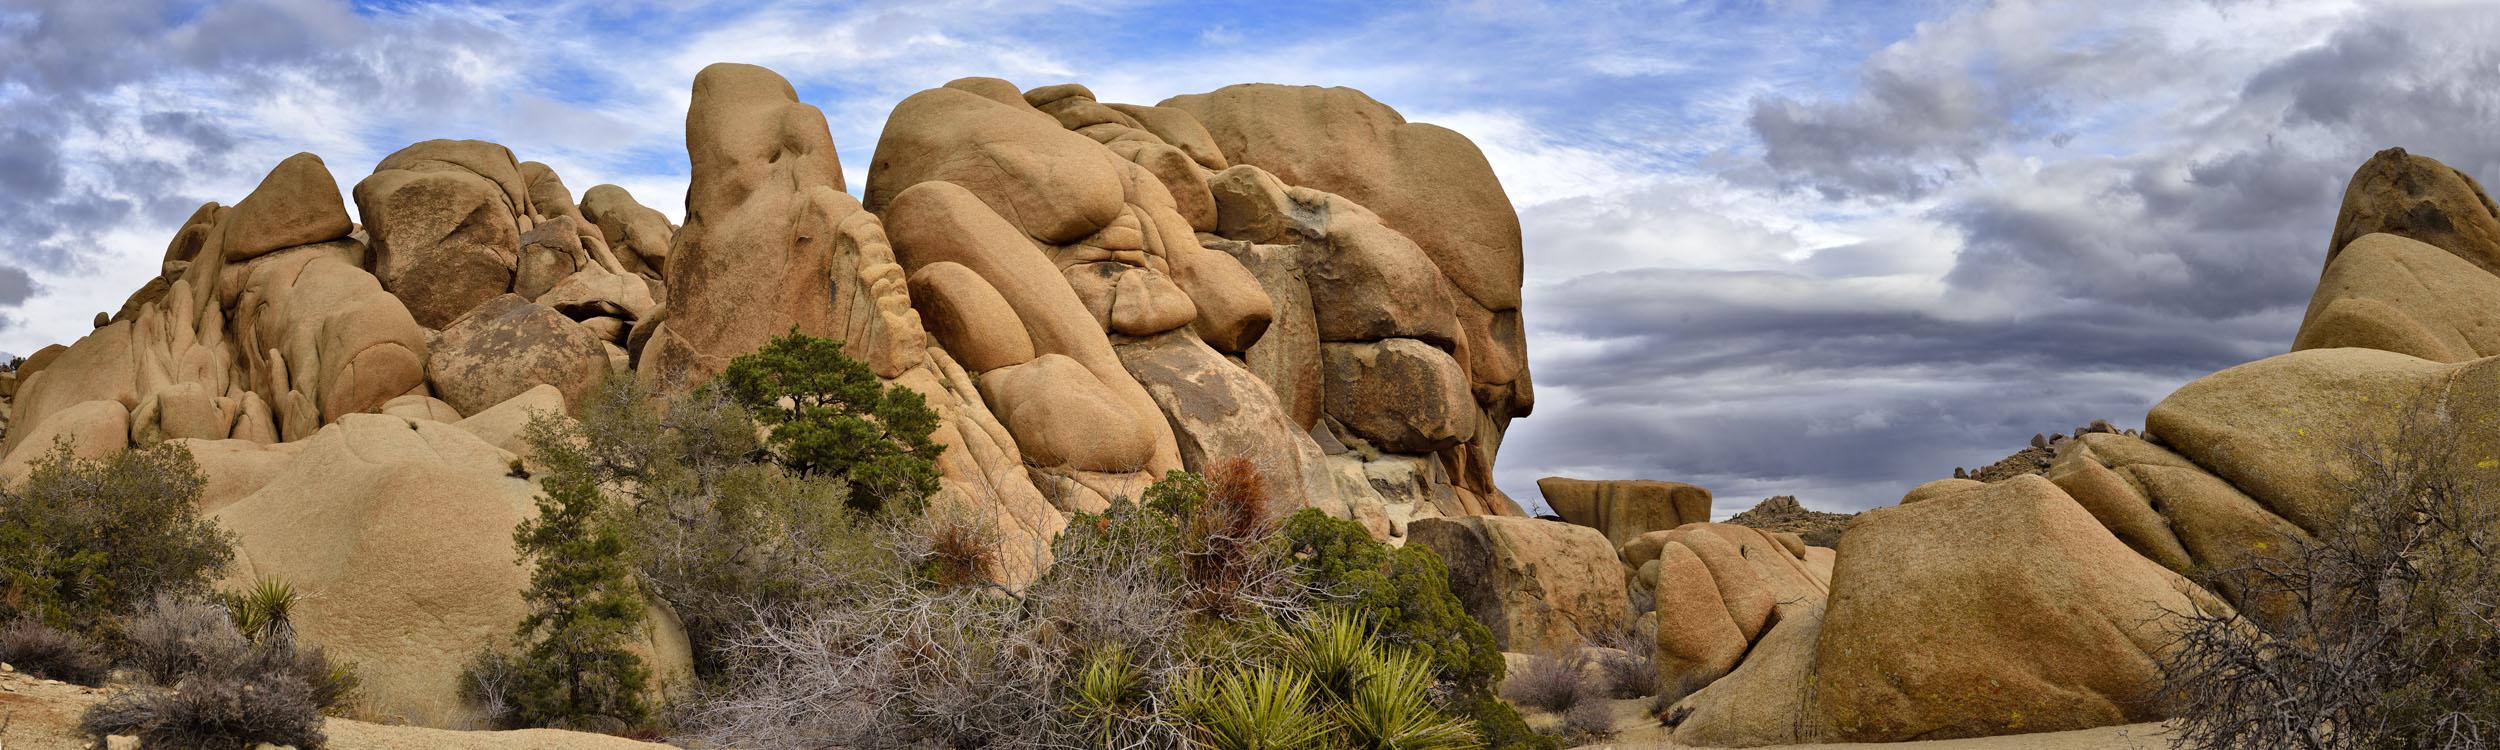 Rock Formation in Joshua Tree